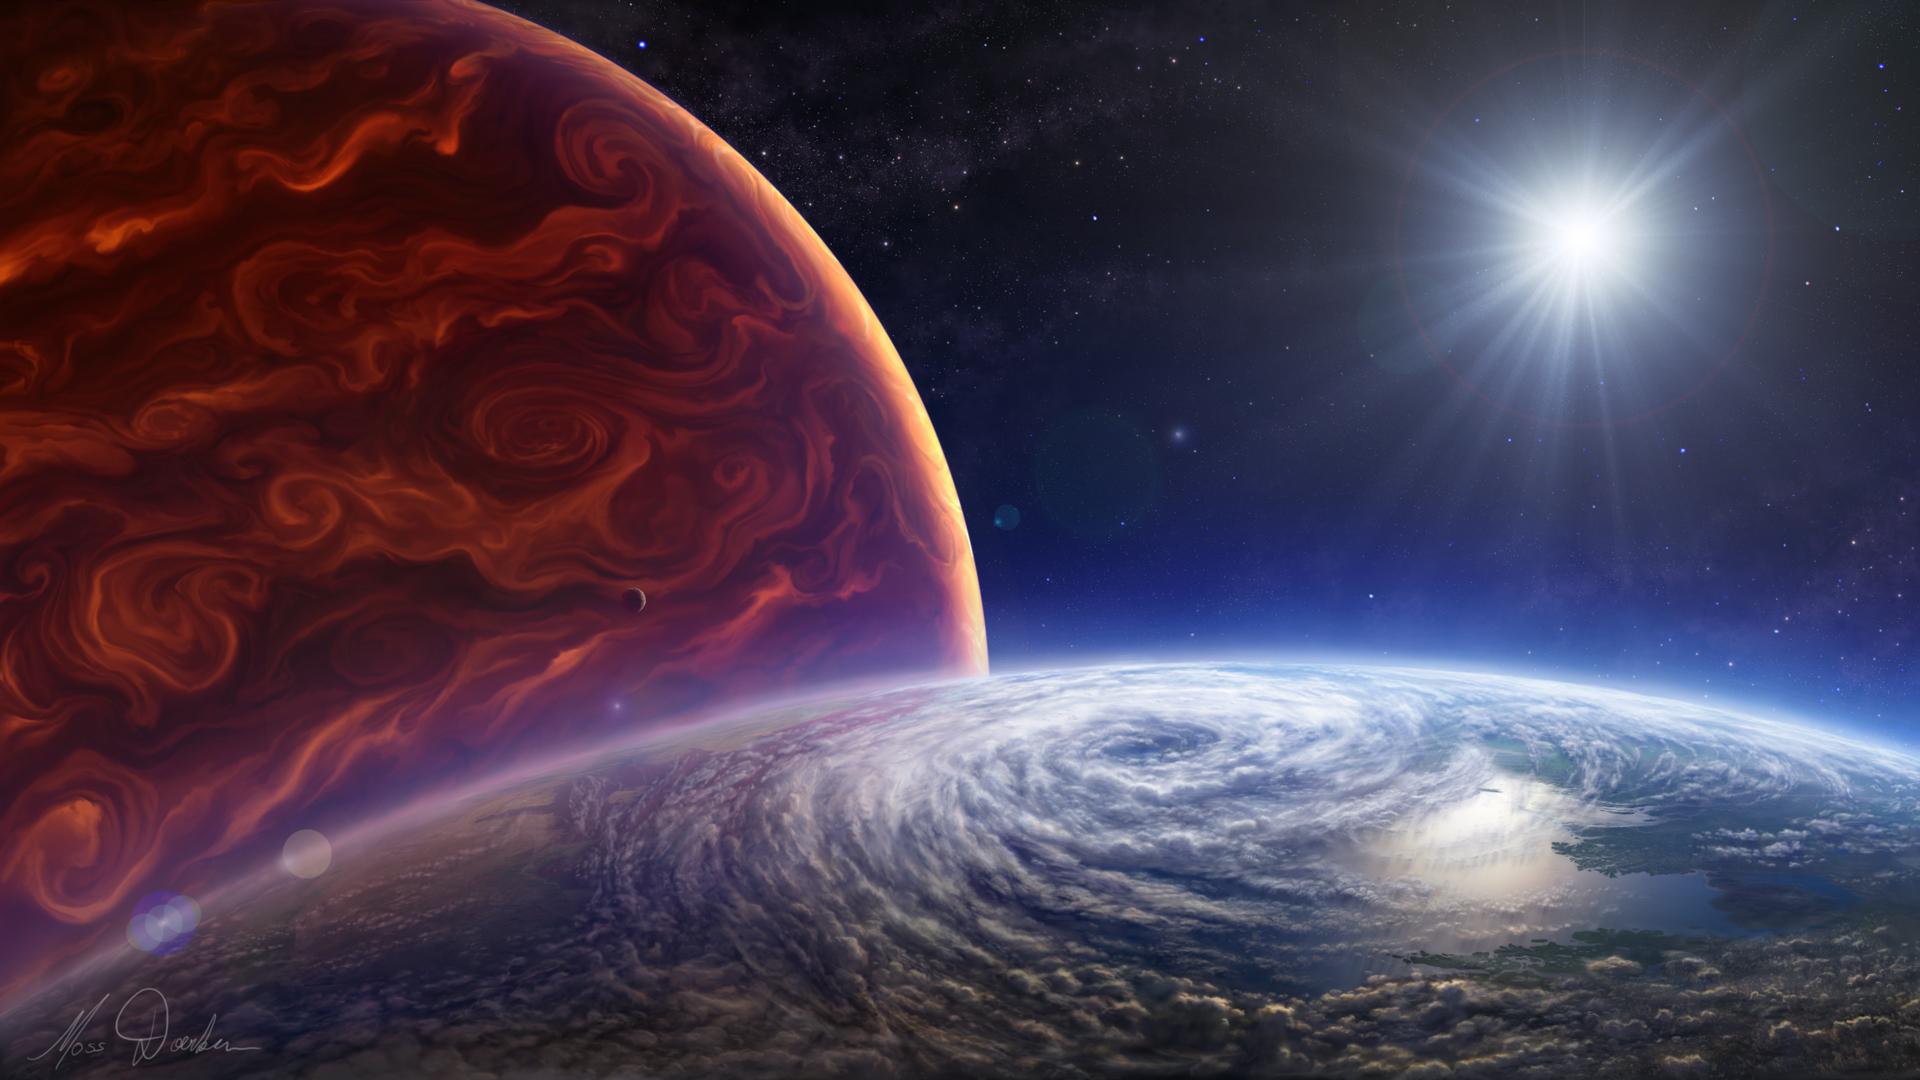 brown dwarf habitable planet - photo #40